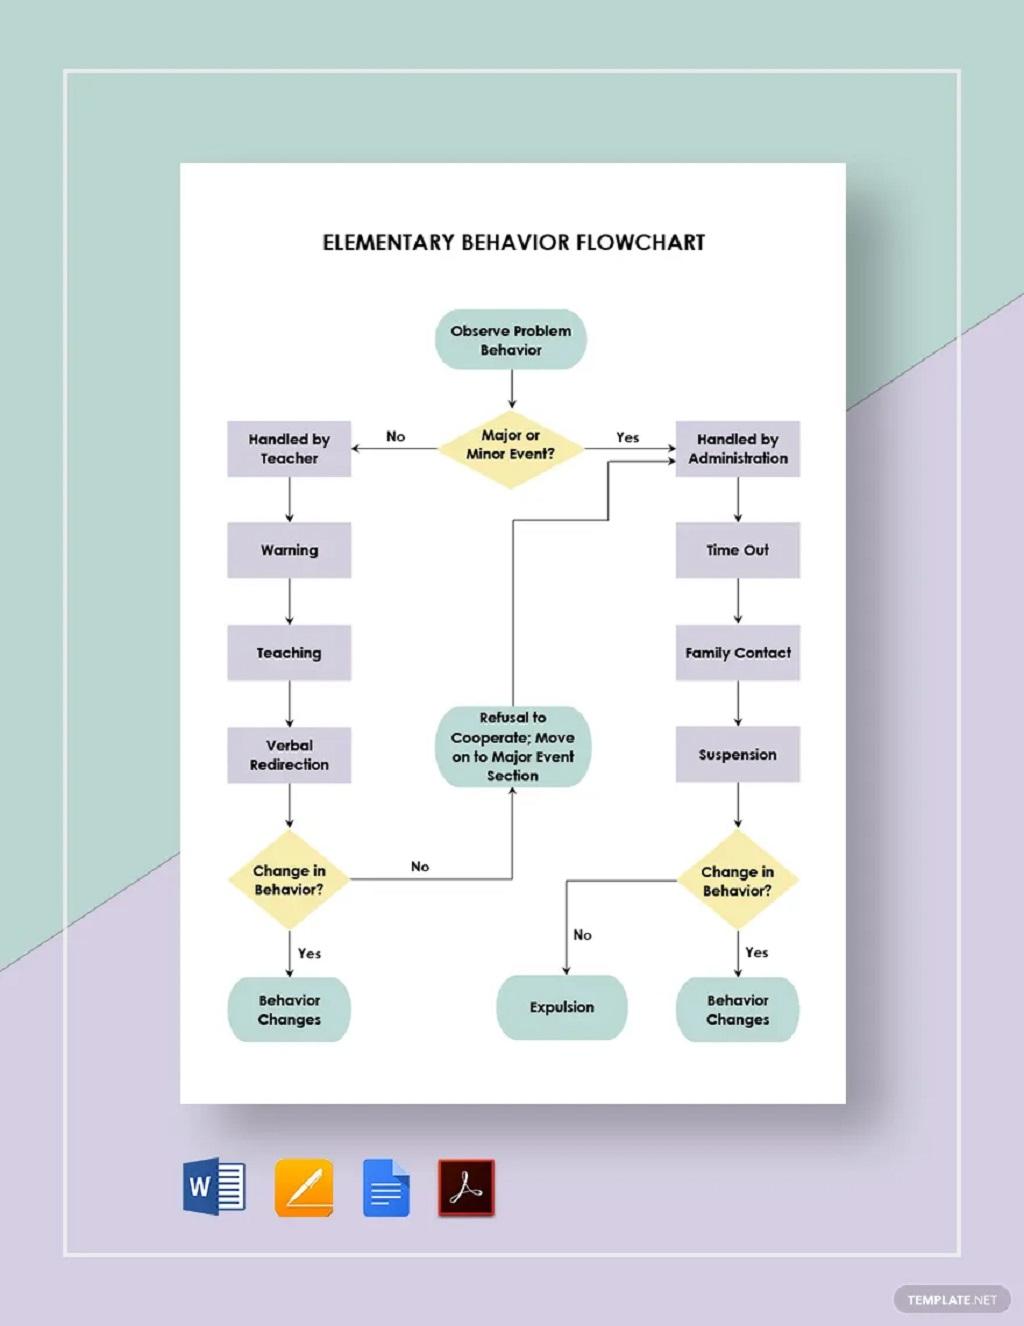 Elementary Behavior Flowchart Template Sample Chart Printable Charts For Home Pdf Preschool Teachers Classroom  Samples Large